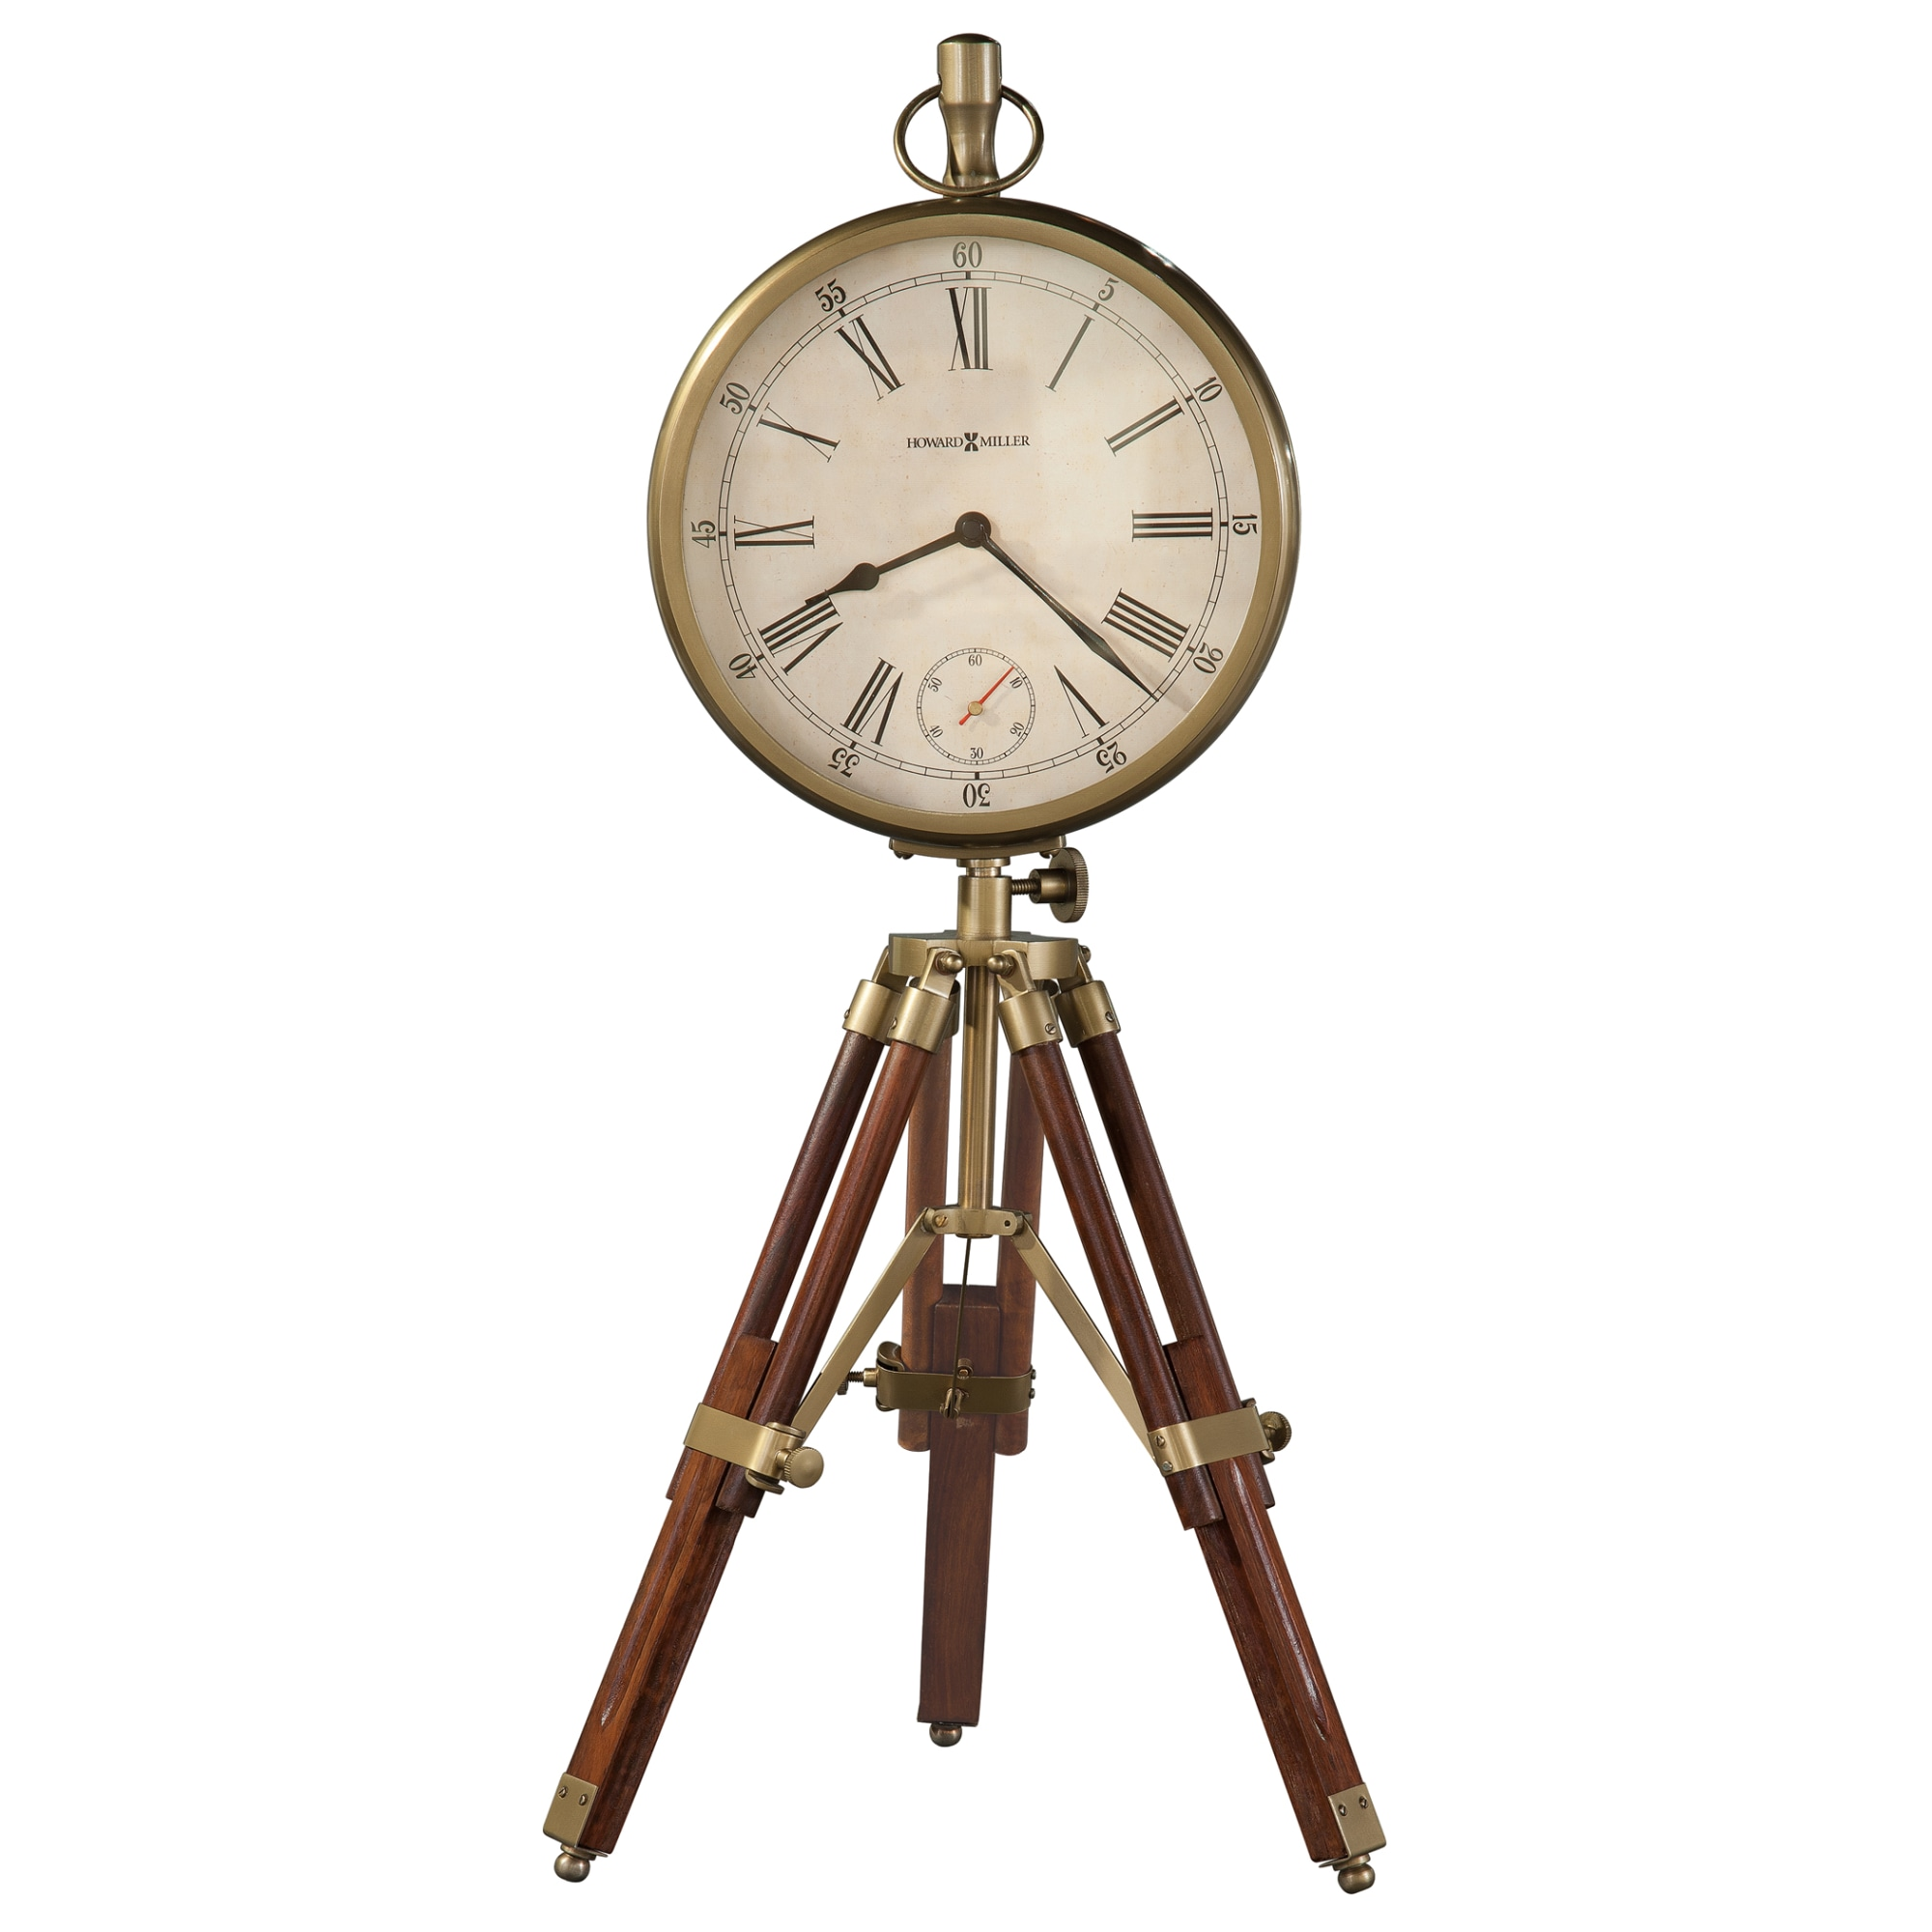 Image for 635-192 Time Surveyor Mantel from Howard Miller Official Website